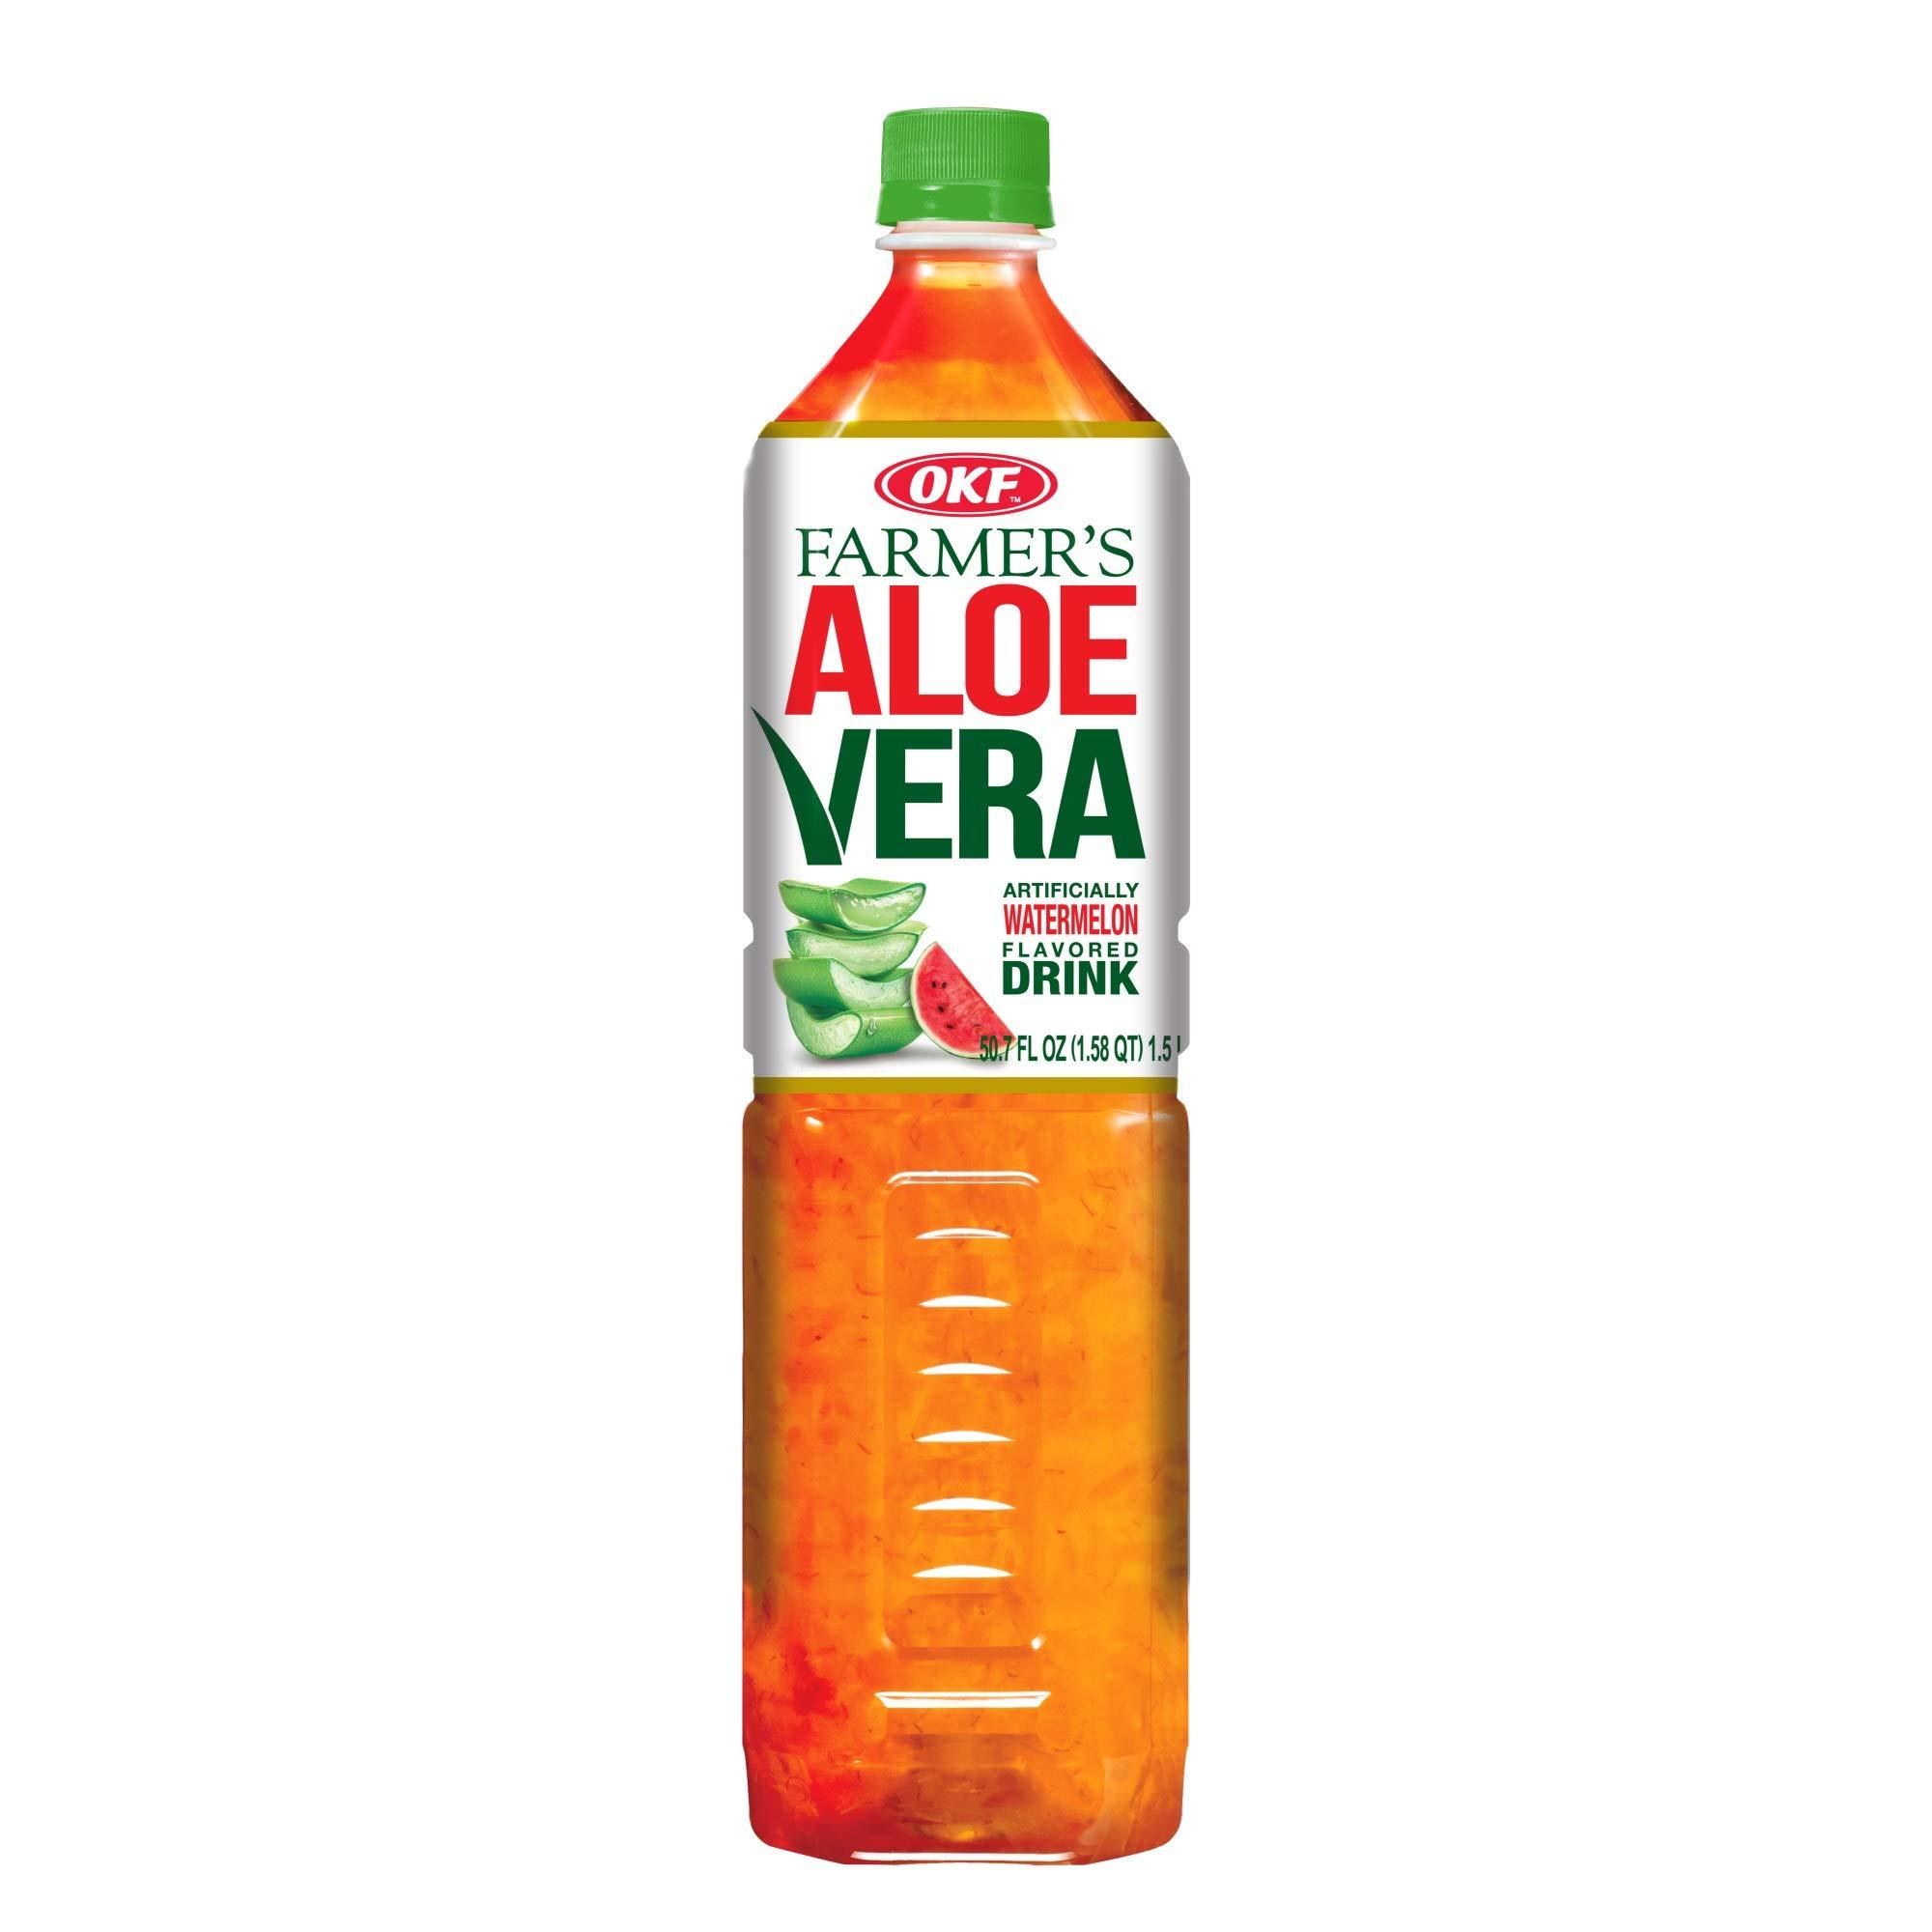 OKF Farmer's Aloe Vera Drink, Watermelon, 1.5 Liter (Pack of 12)